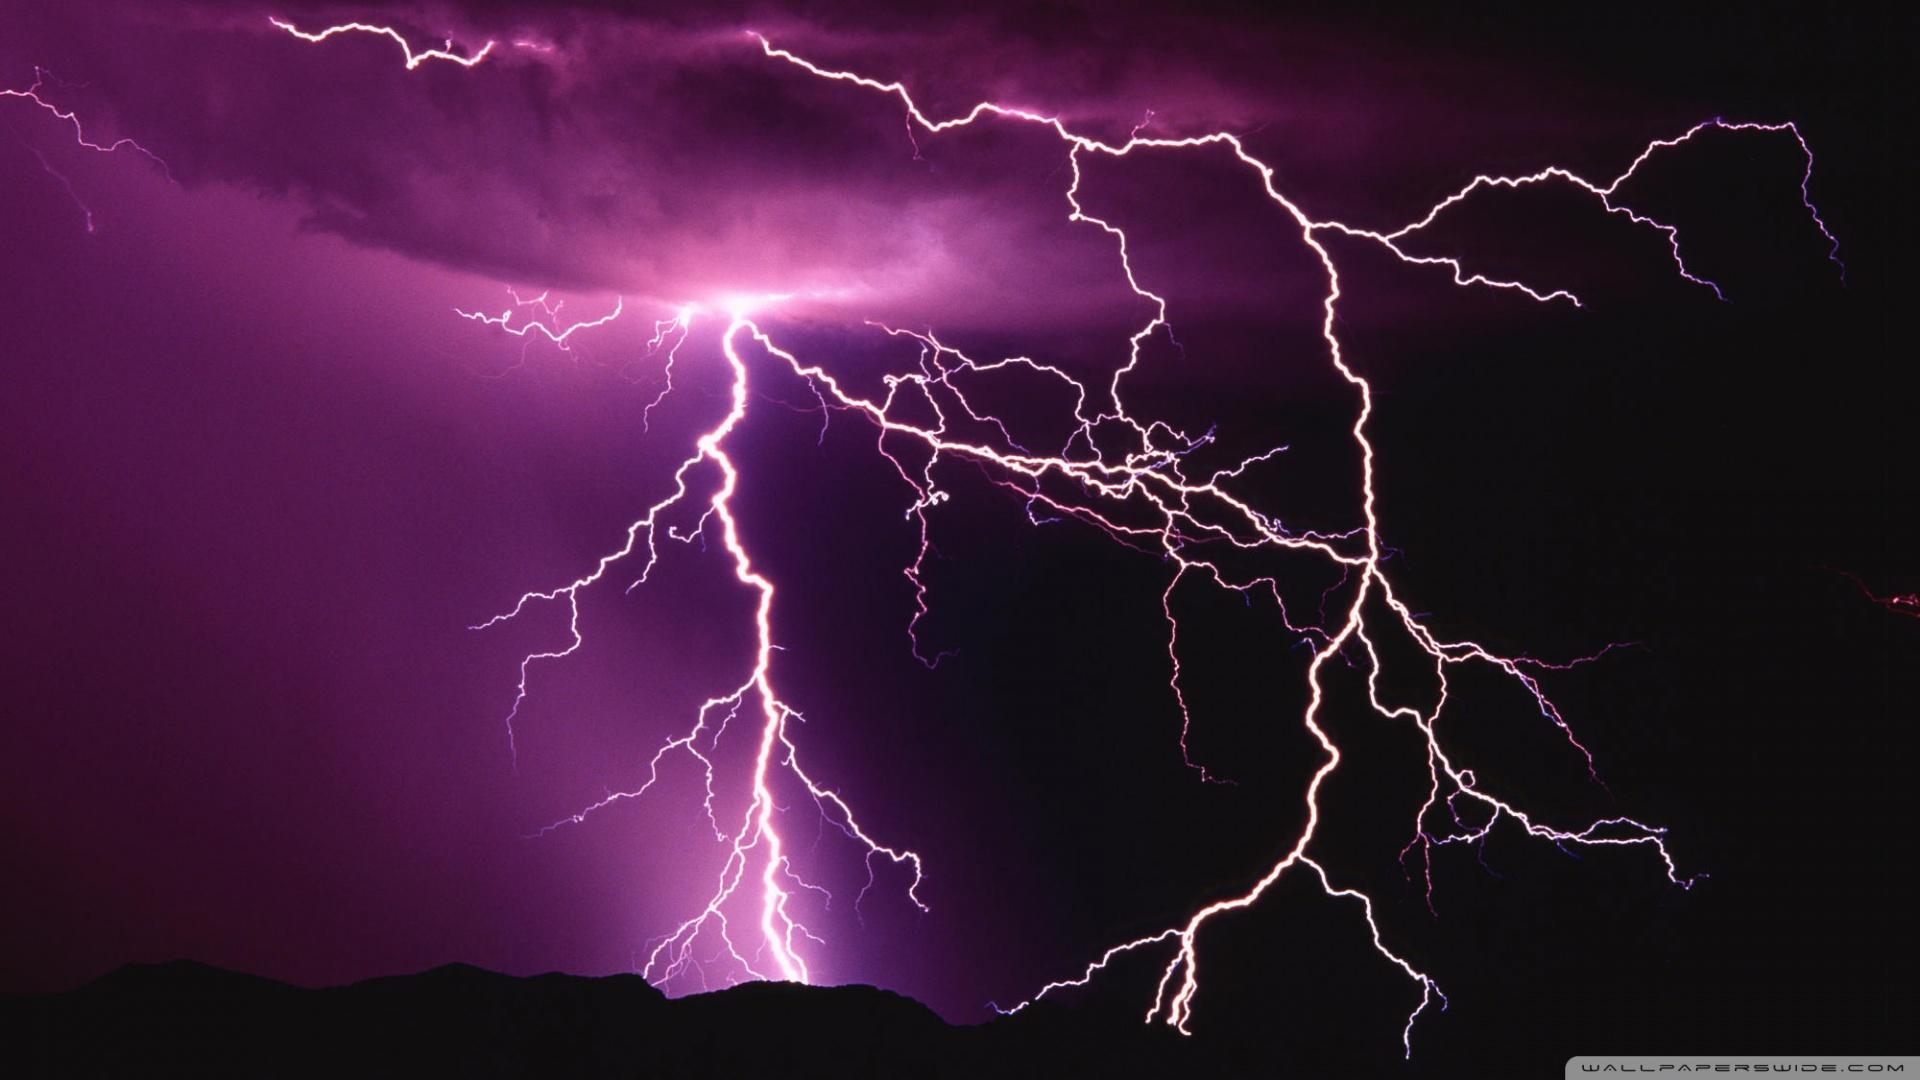 thunderstorm wallpaper HD